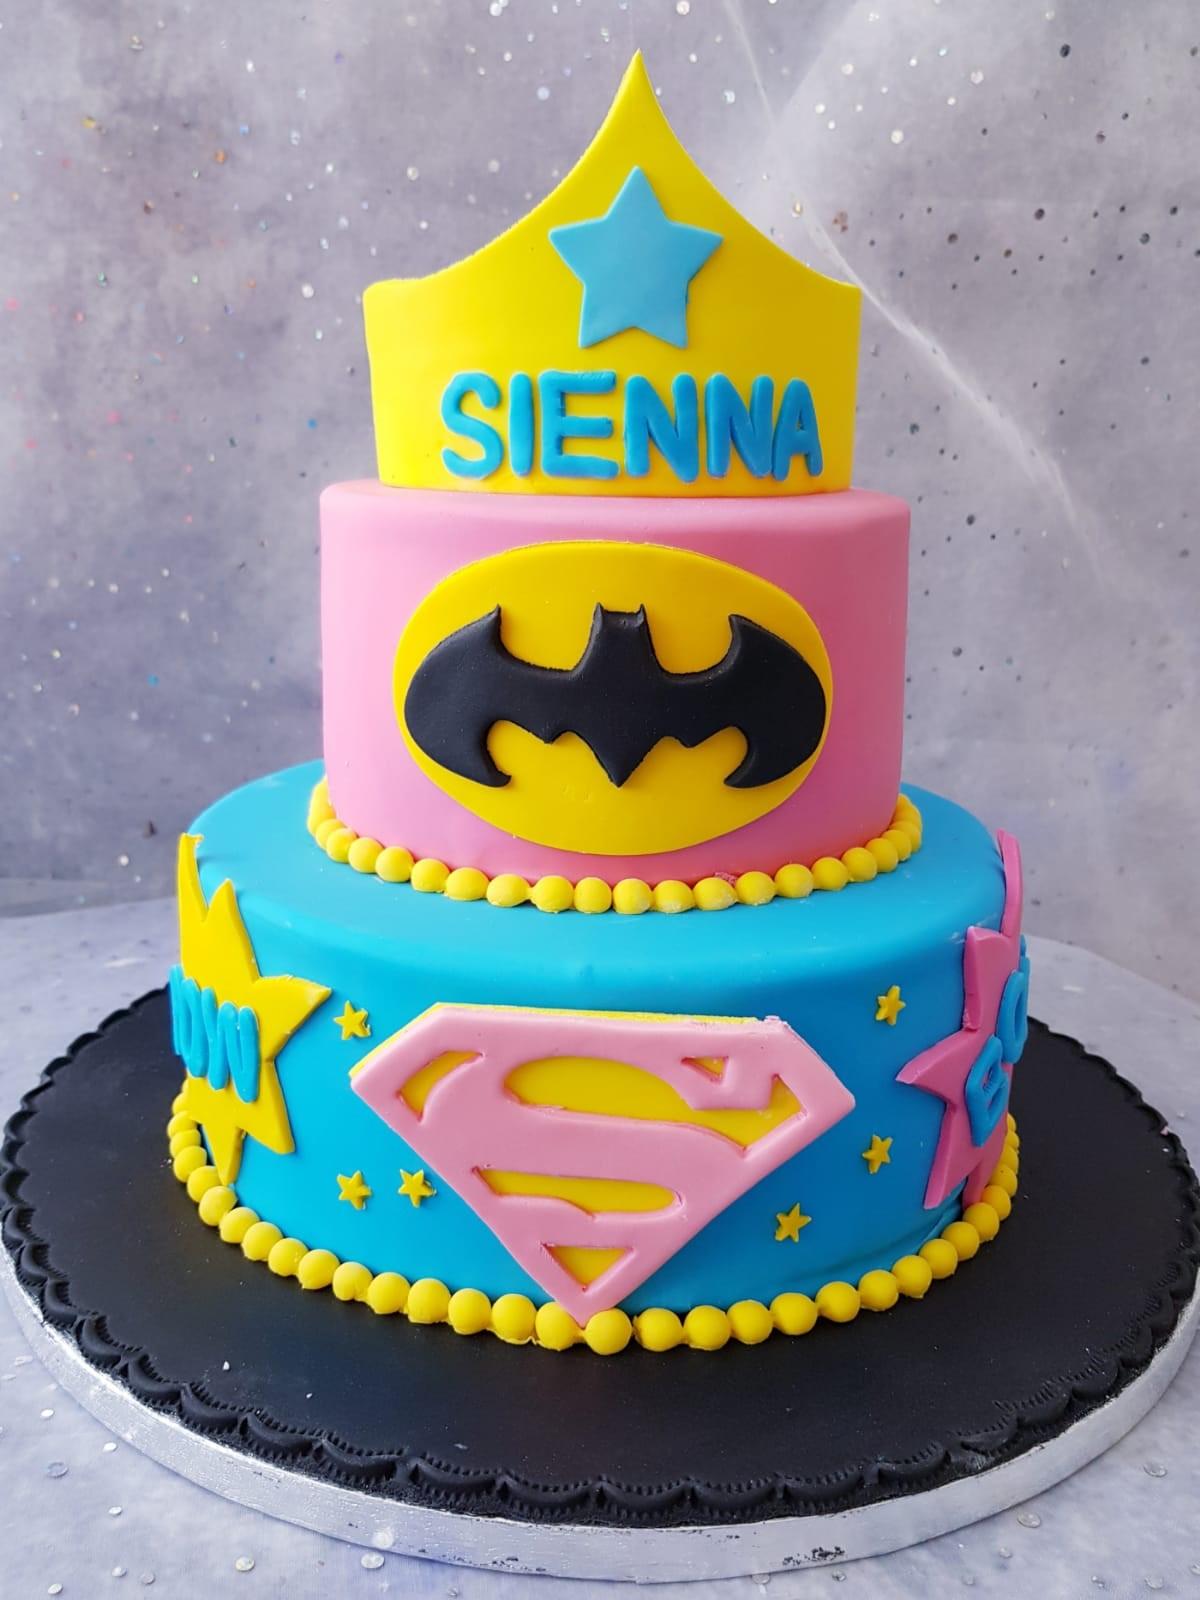 2 Tier Superhero Cake Ravens Bakery Of Essex Ltd